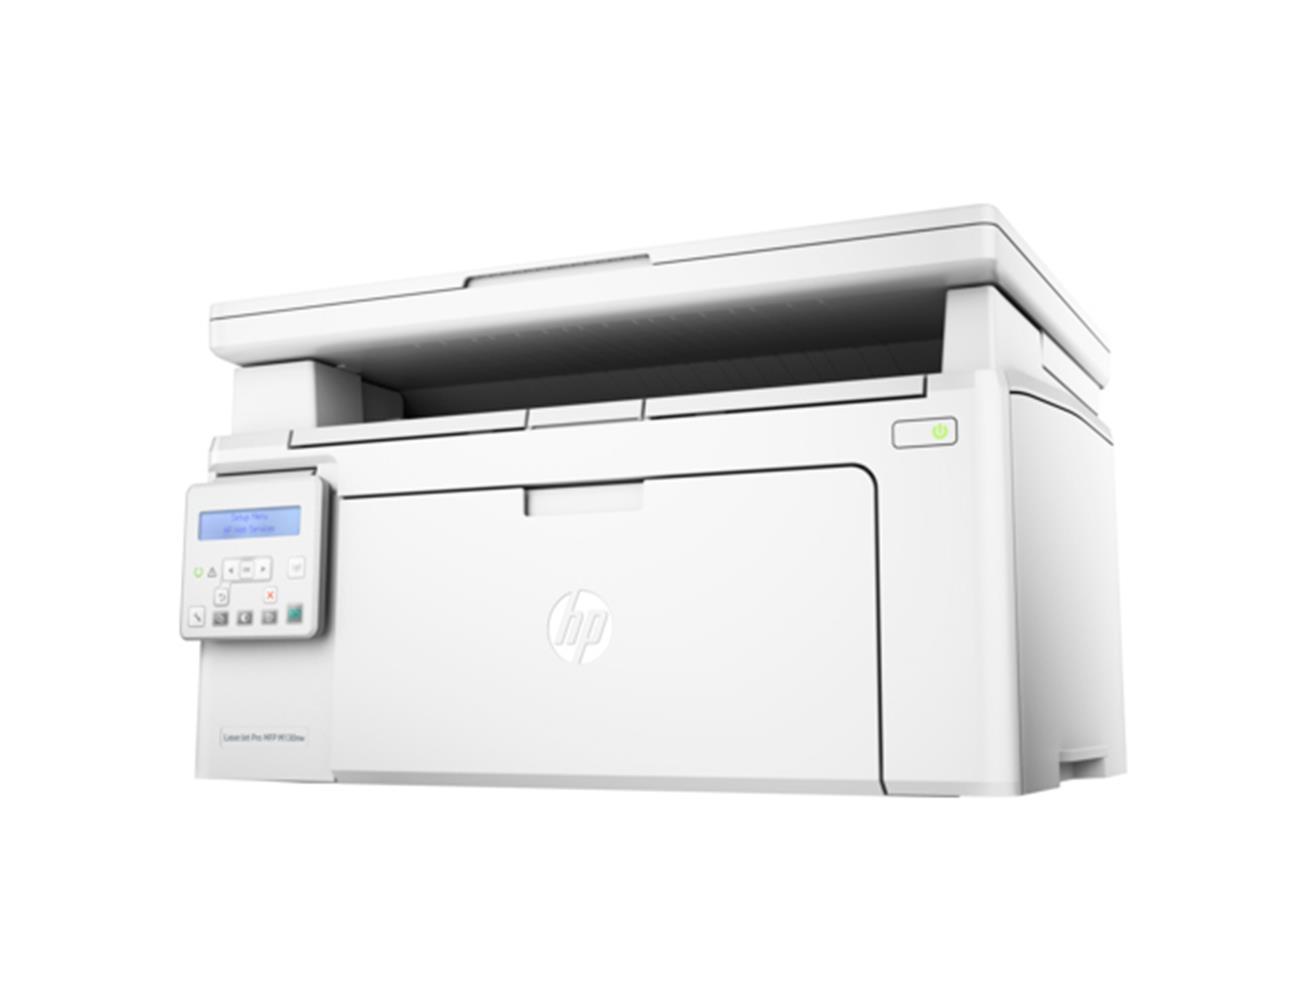 HP LaserJet Pro MFP M130nw Wireless Printer,Apple AirPrint